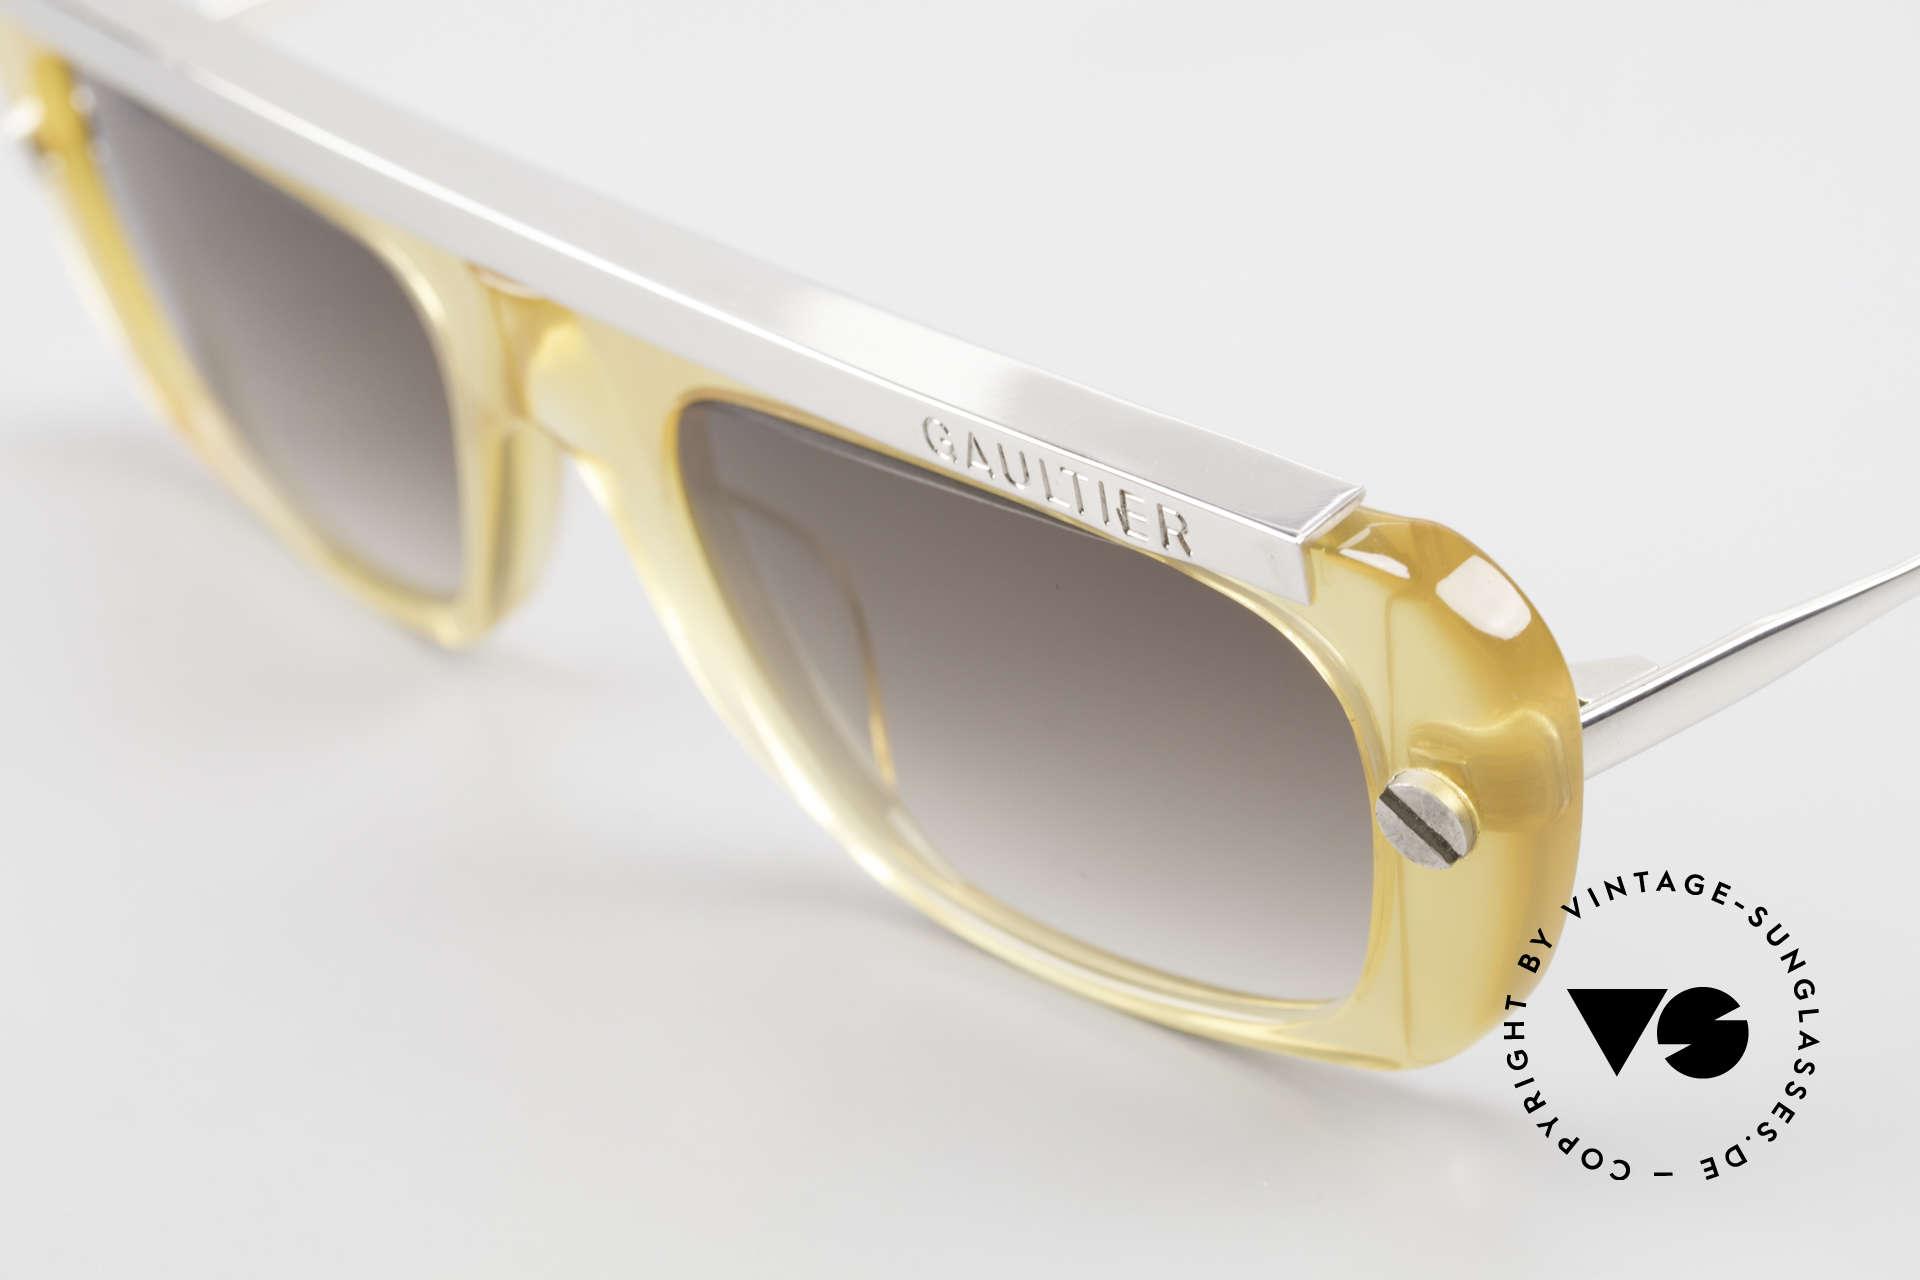 Jean Paul Gaultier 55-0771 Striking Vintage JPG Shades, unworn (like all our old 90's JP Gaultier eyewear), Made for Men and Women